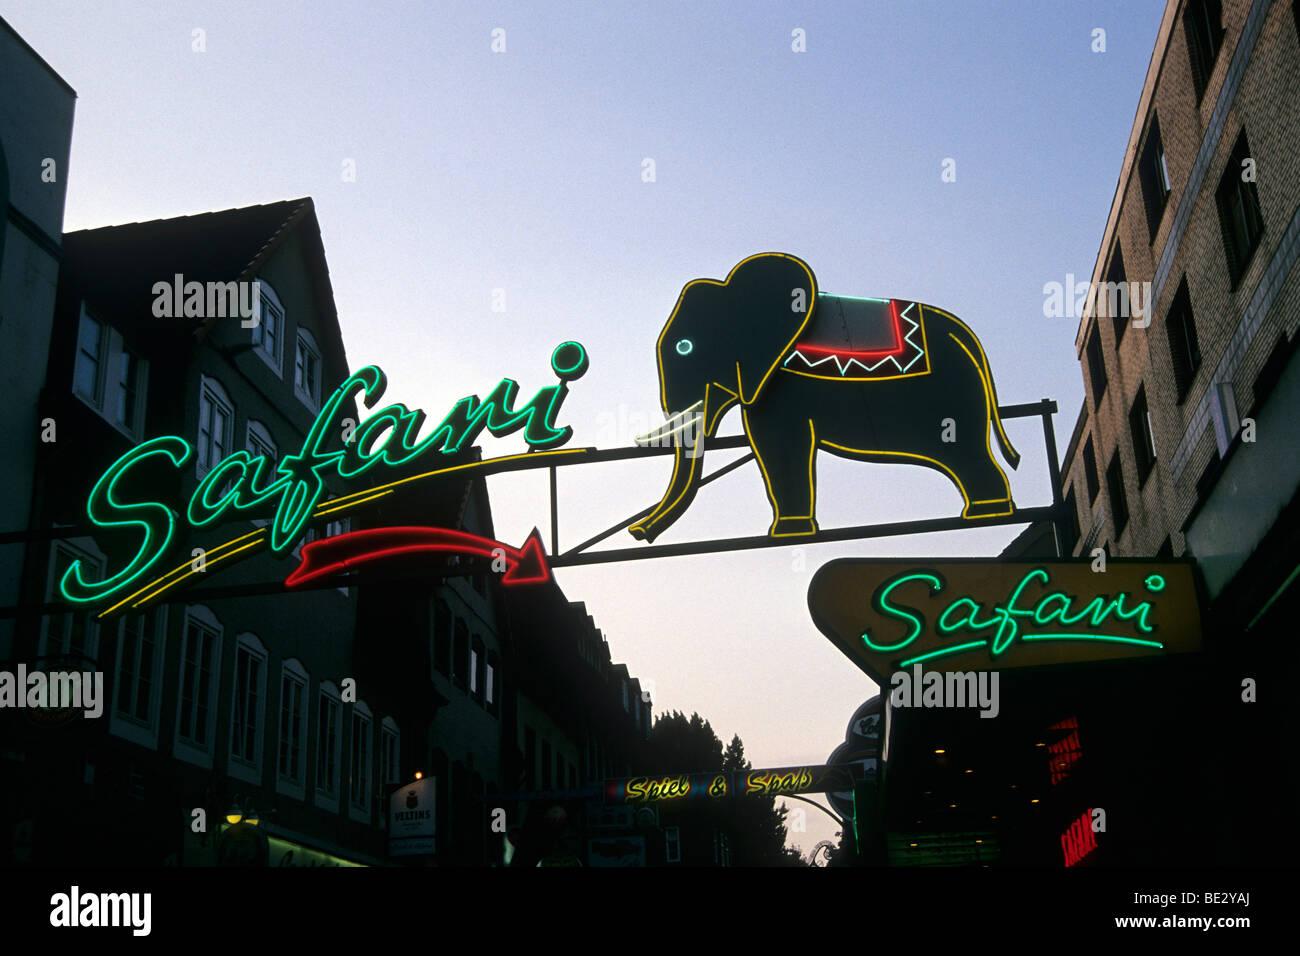 Safari lettering with a neon elephant, Kiez, Reeperbahn, St. Pauli, Hanseatic City of Hamburg, Germany, Europe - Stock Image